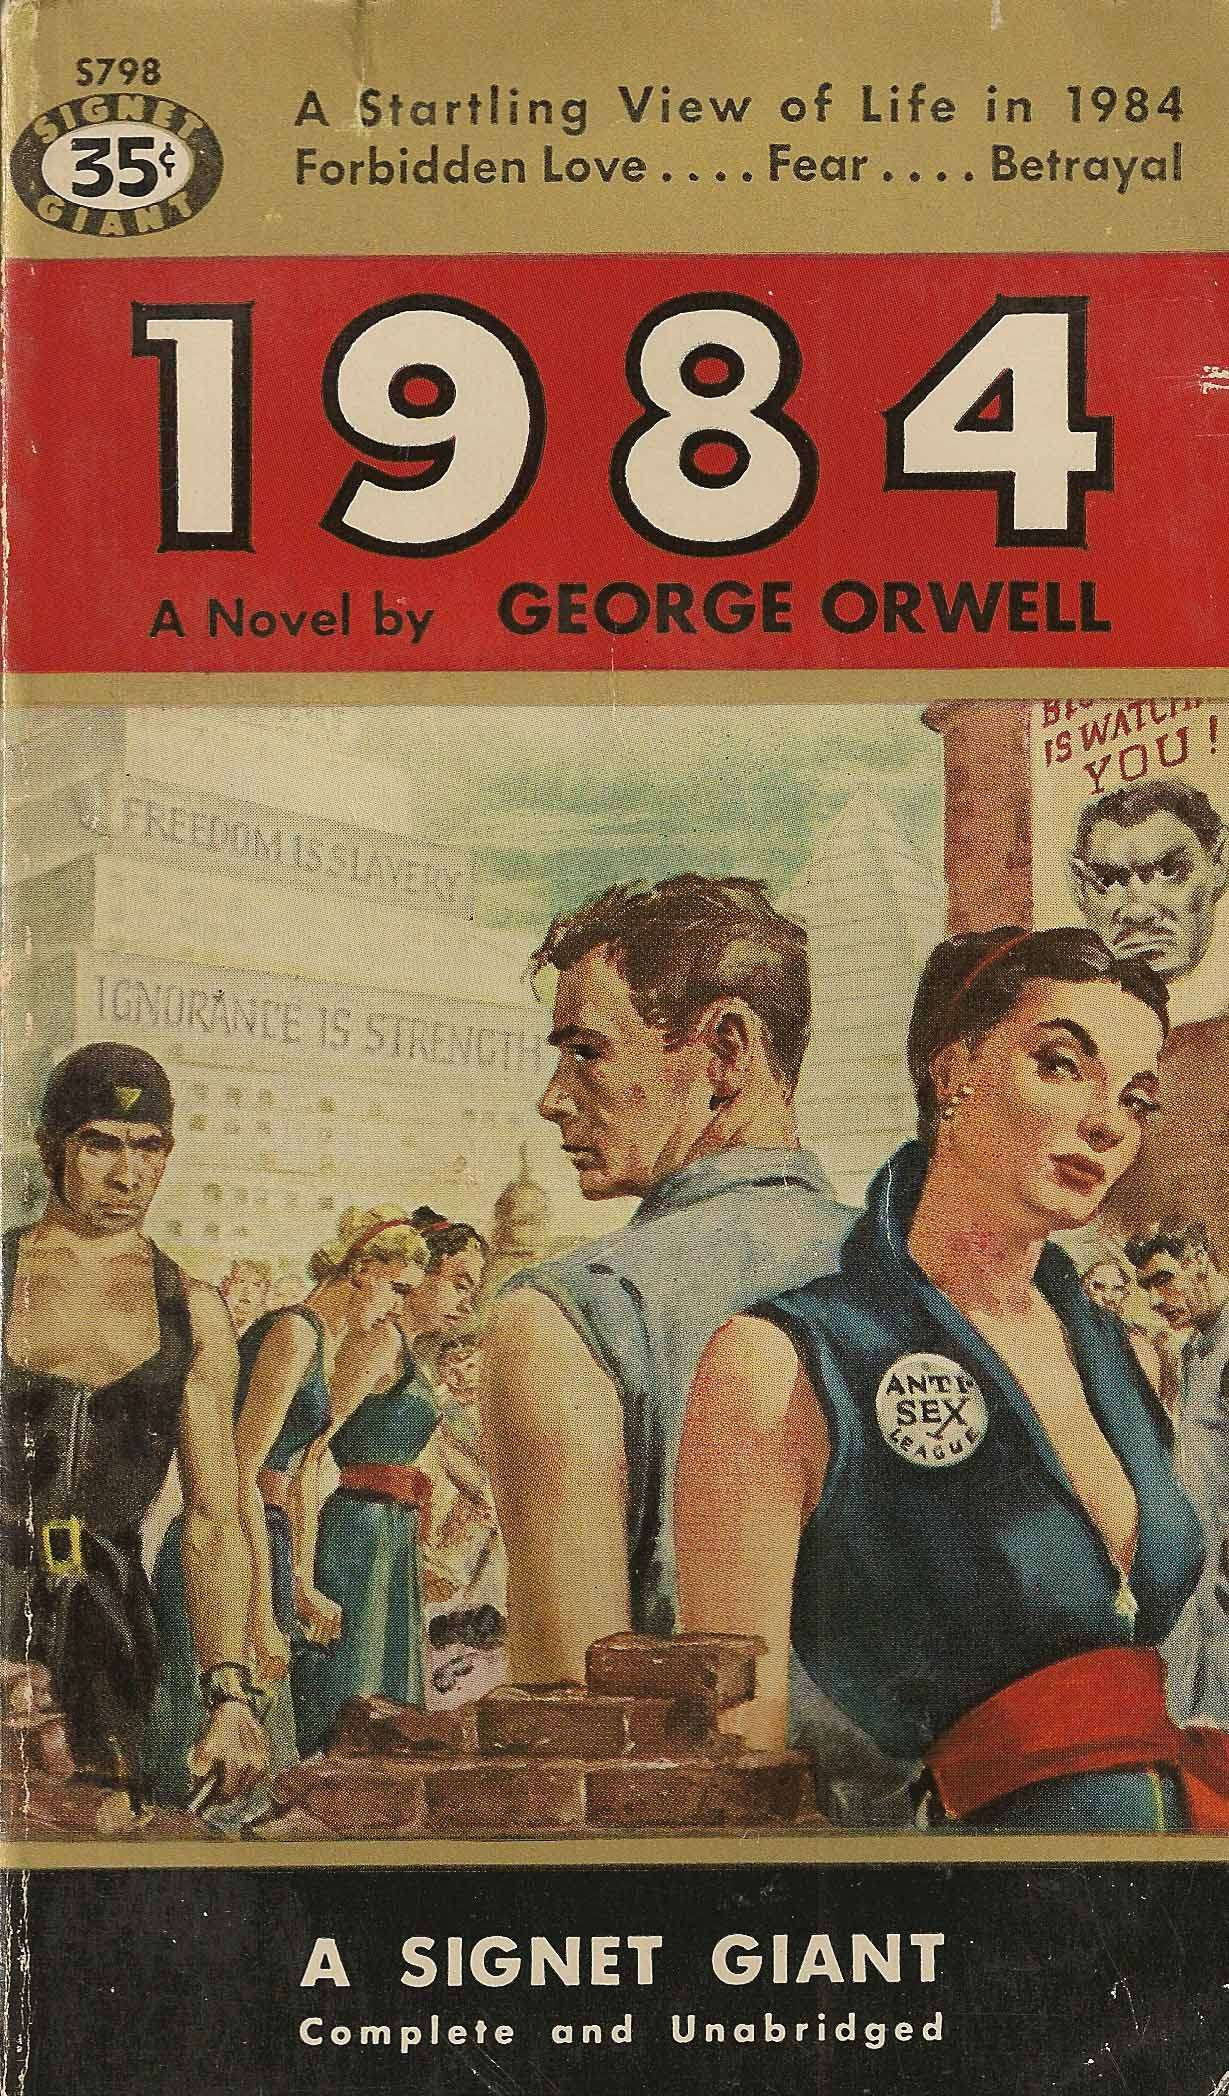 1984 | George Orwell | pulp cover vintage art